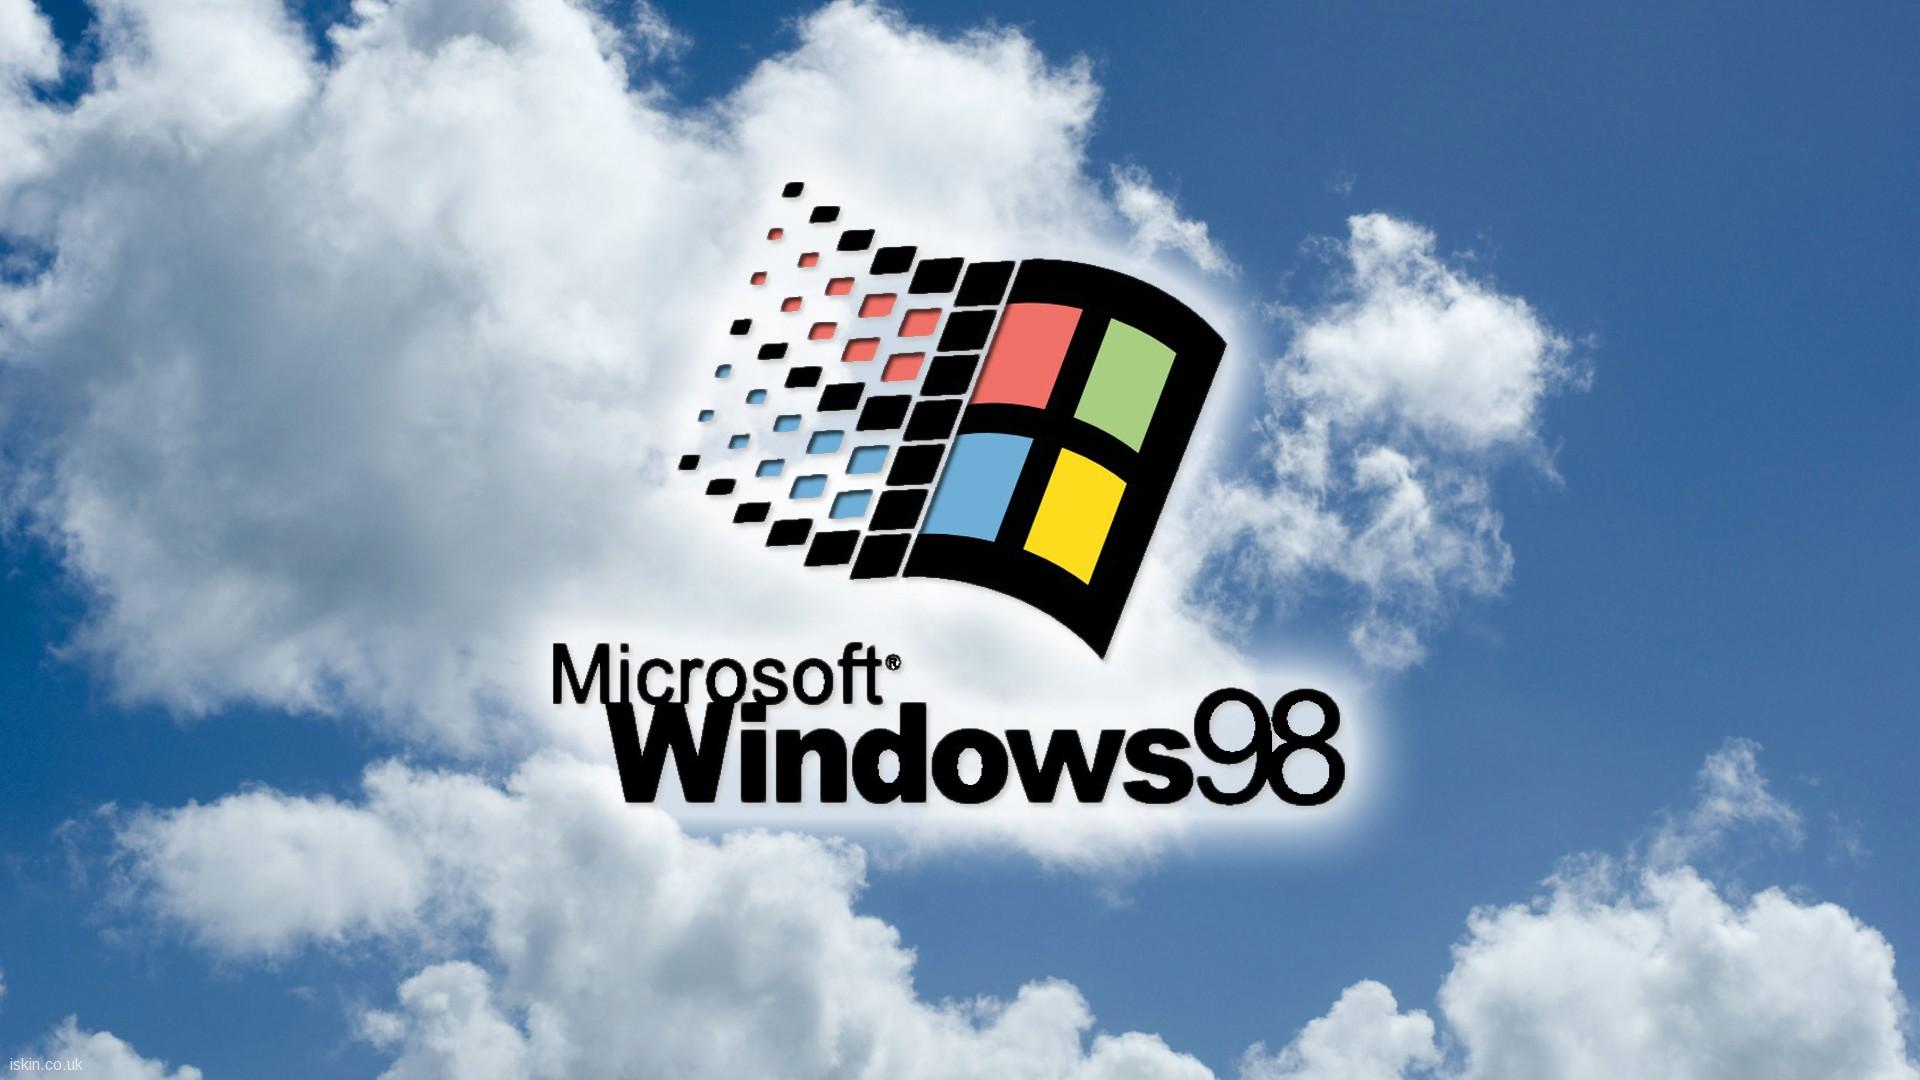 Windows 98 wallpaper wallpapersafari for Latest windows for pc